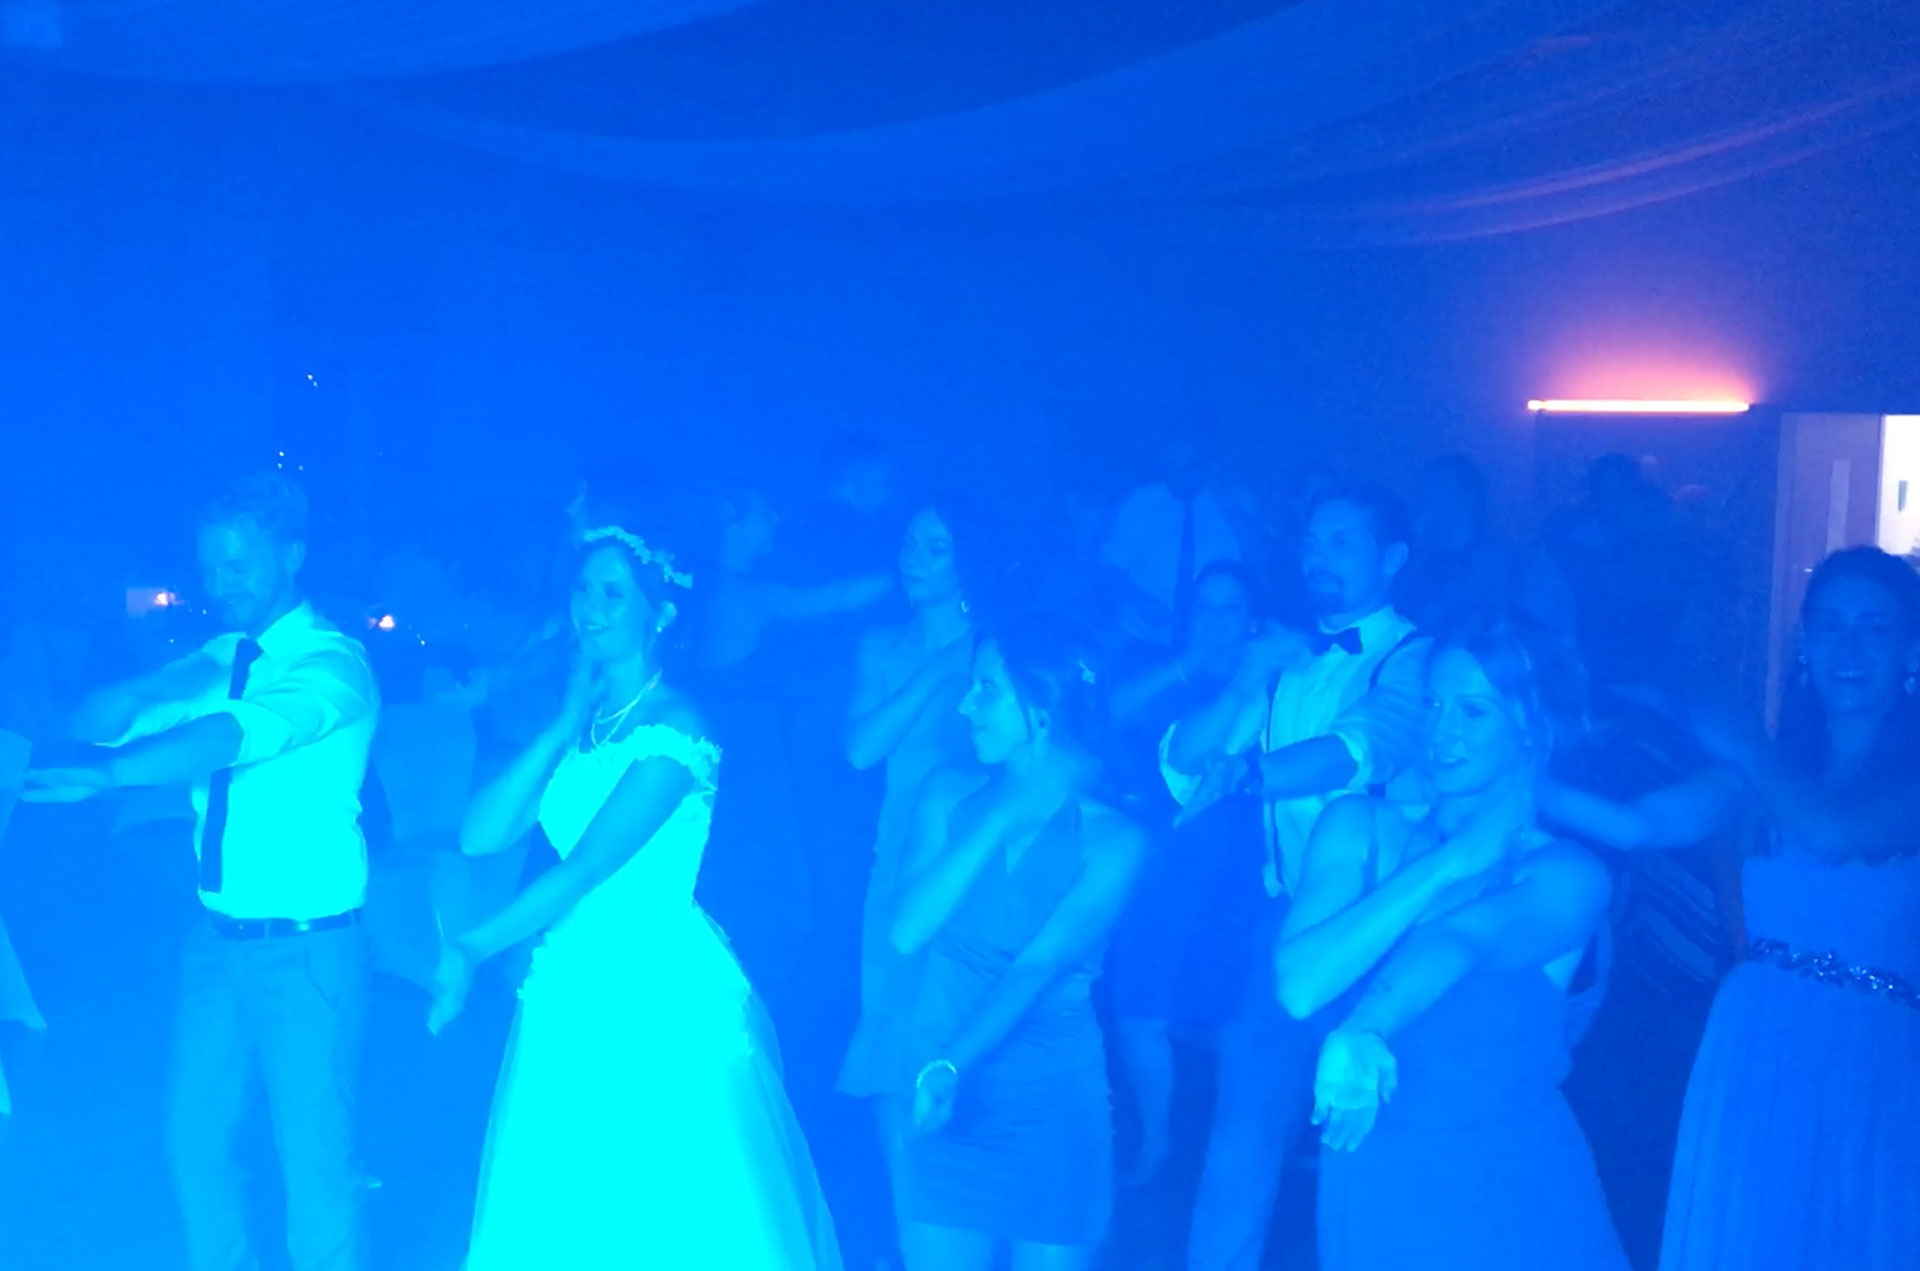 Hochzeits DJ Lollo Impressionen Macarena